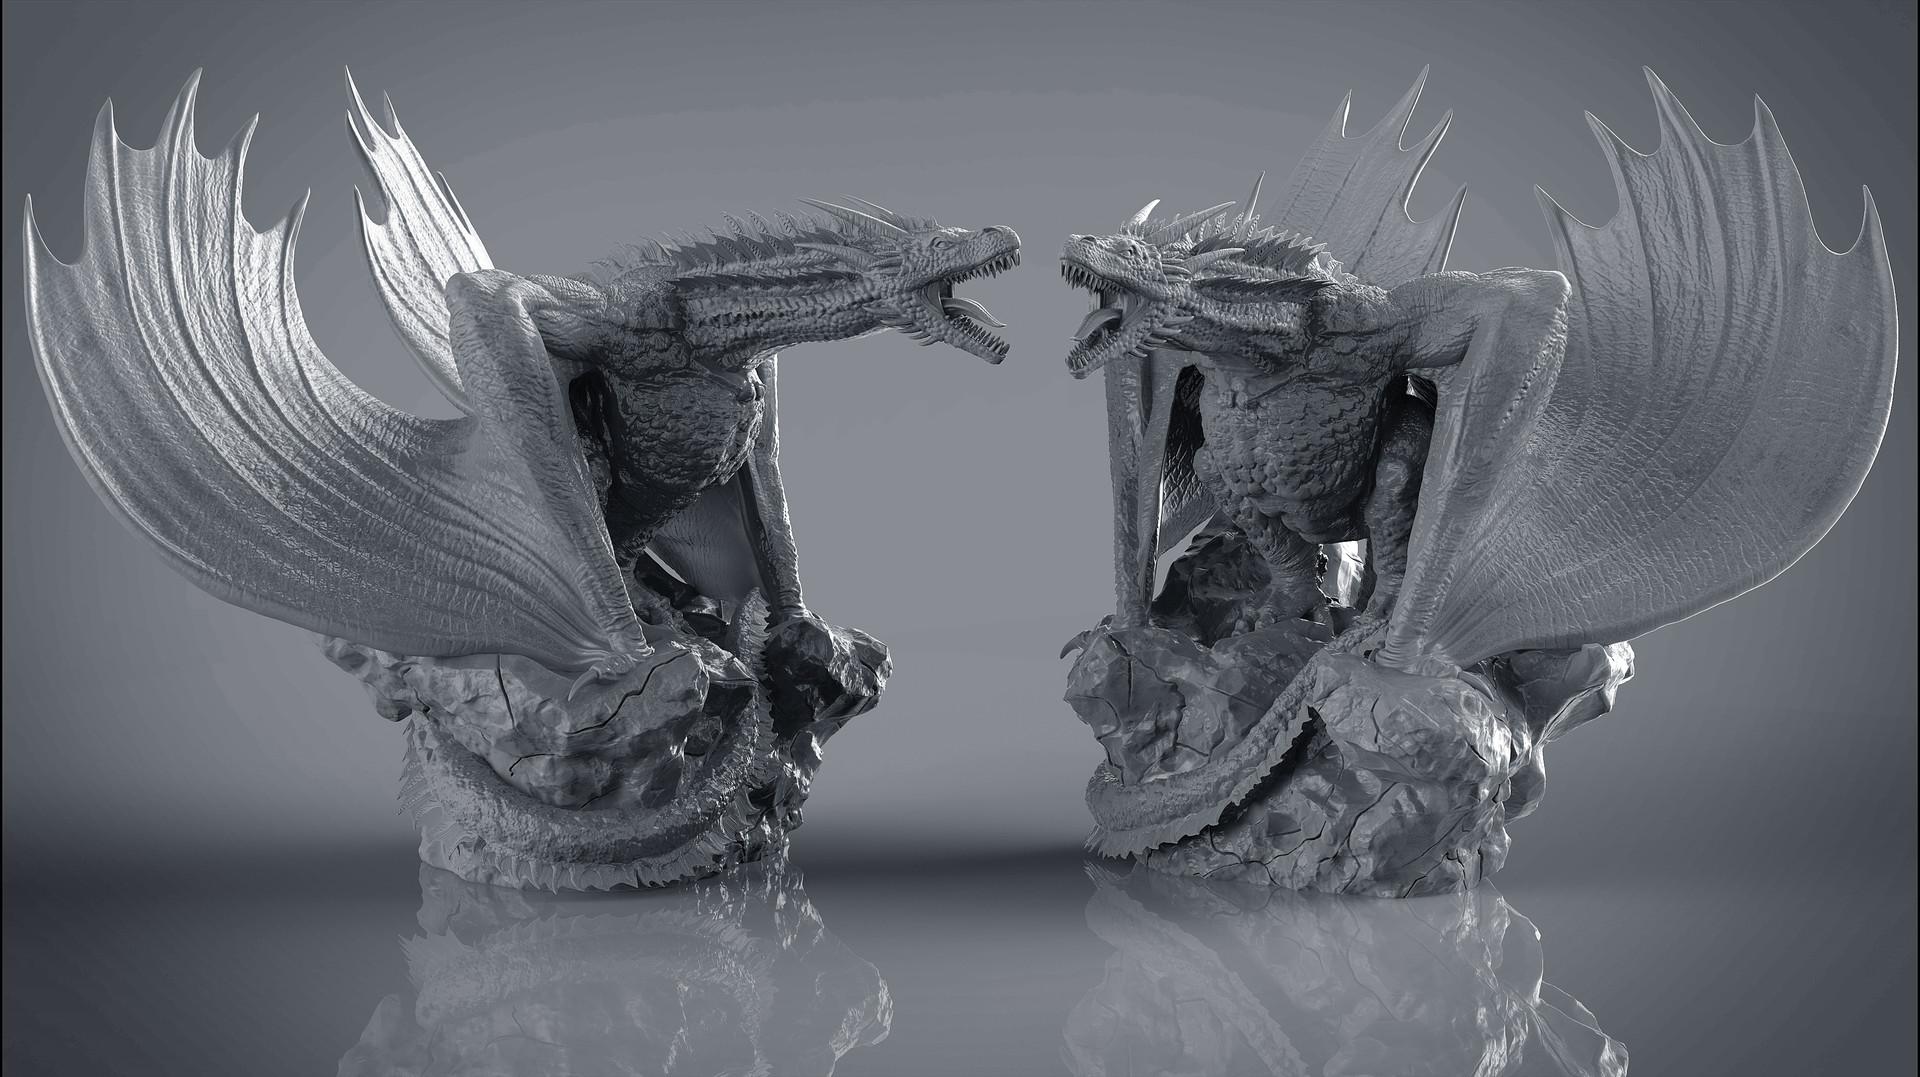 Francesco orru dragon